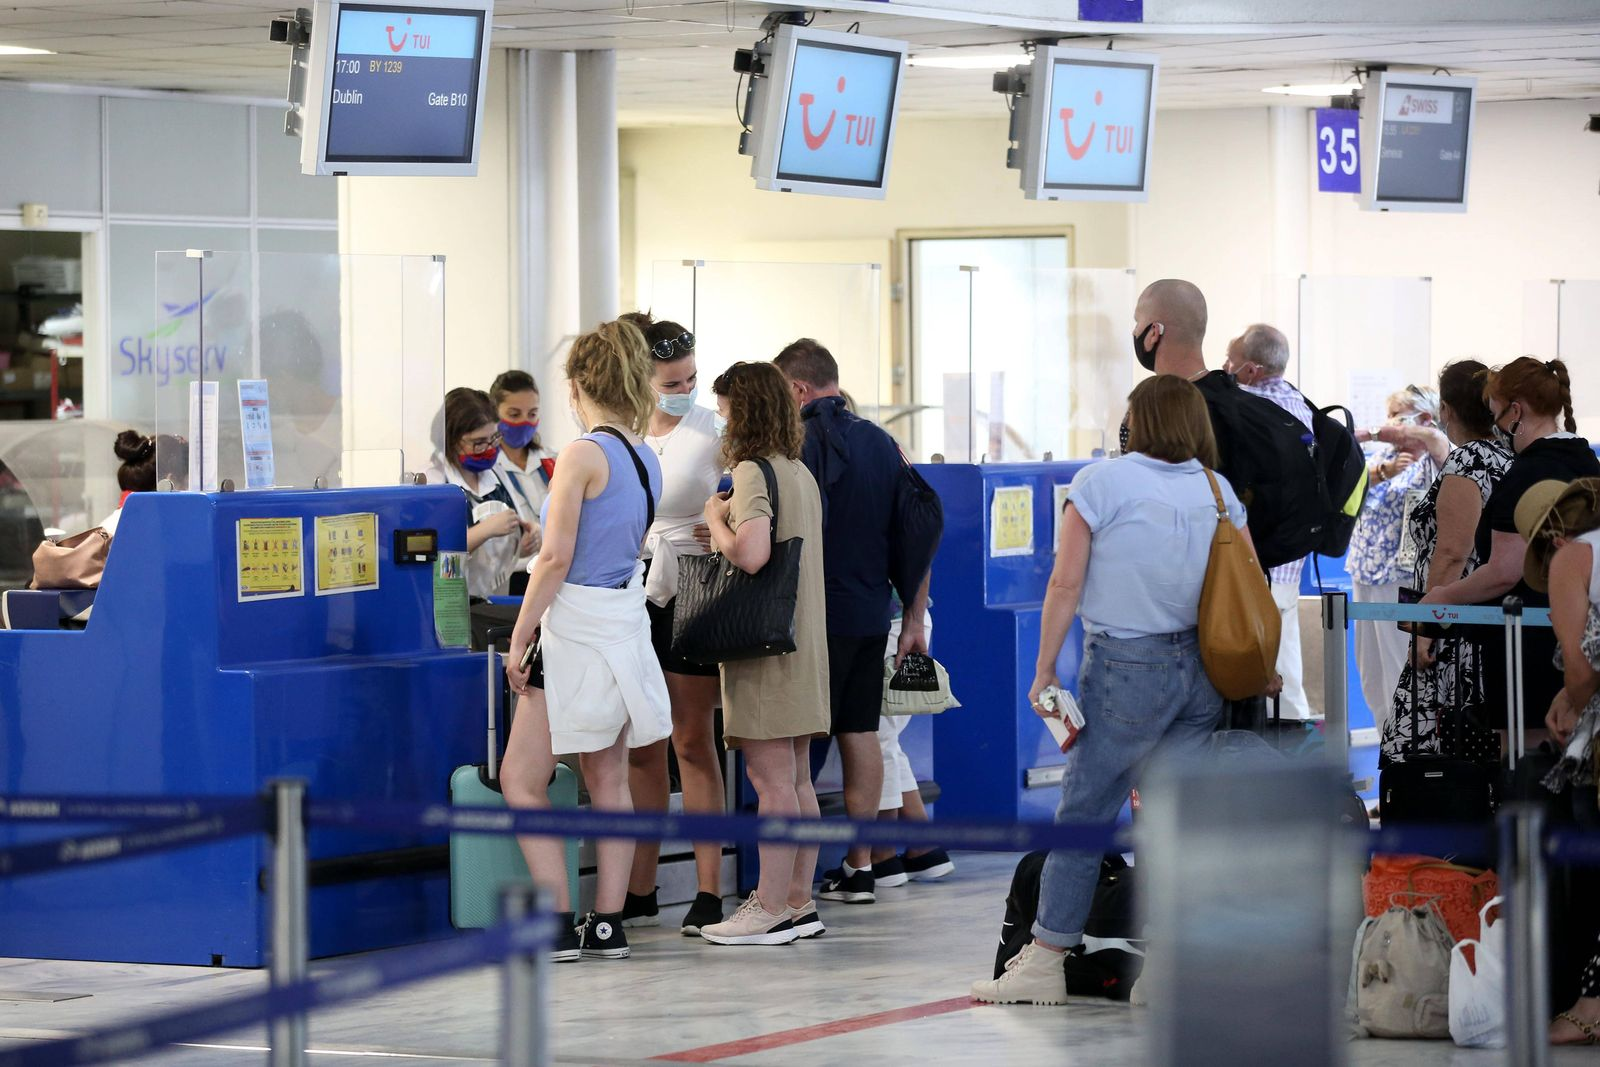 September 8, 2020, Heraklion, Crete, Greece: Departure of British Tourists From Heraklion airport. The British who retu